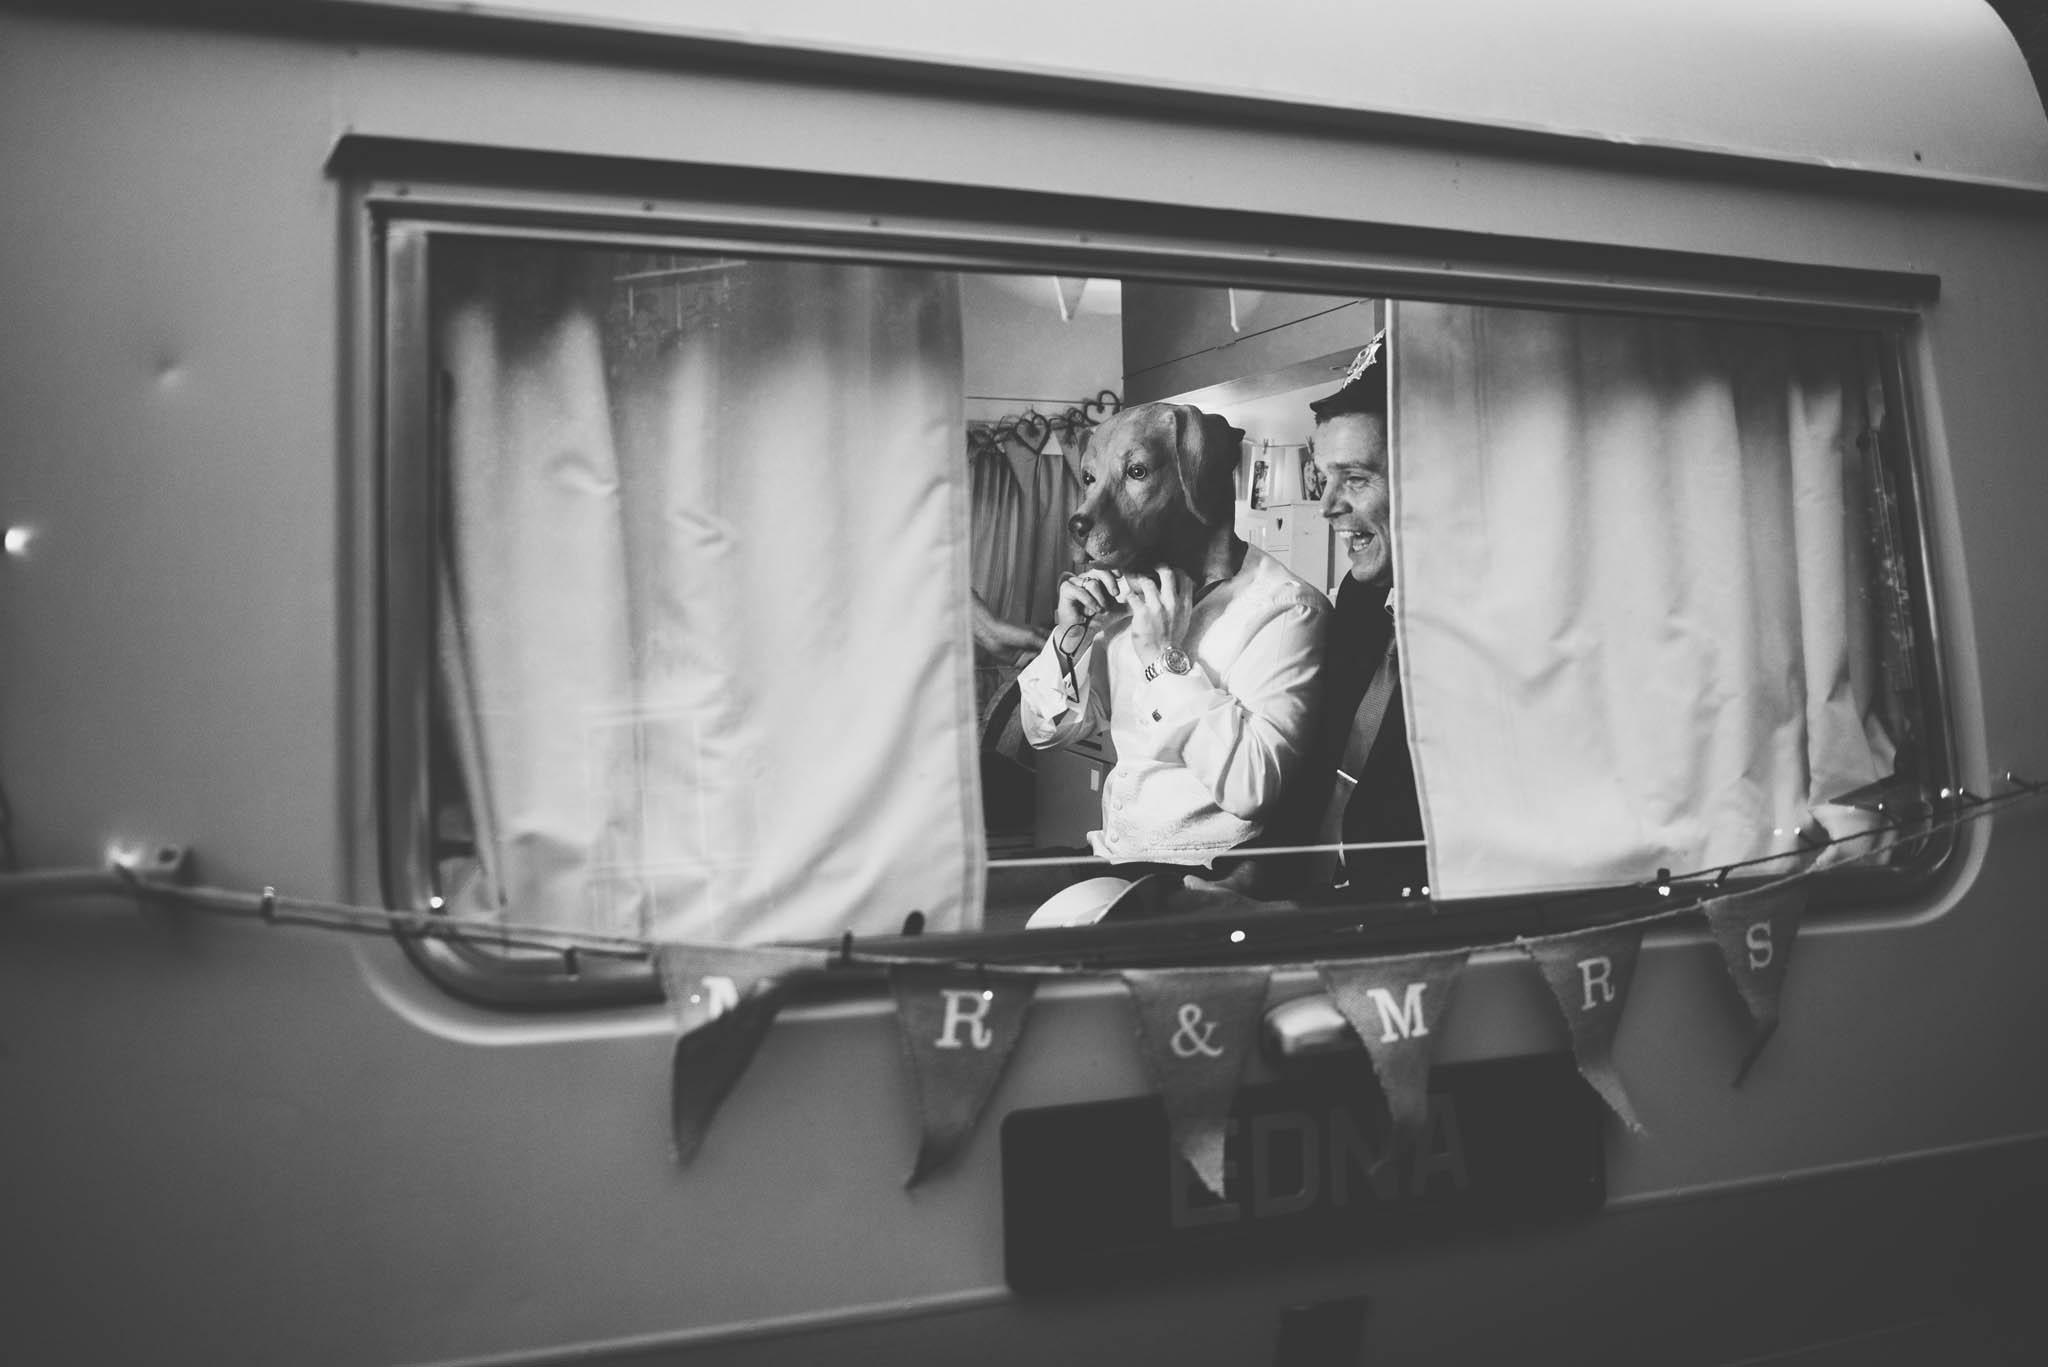 dog-mask-wedding-blog-scott-stockwell-photography-end-2017.jpg